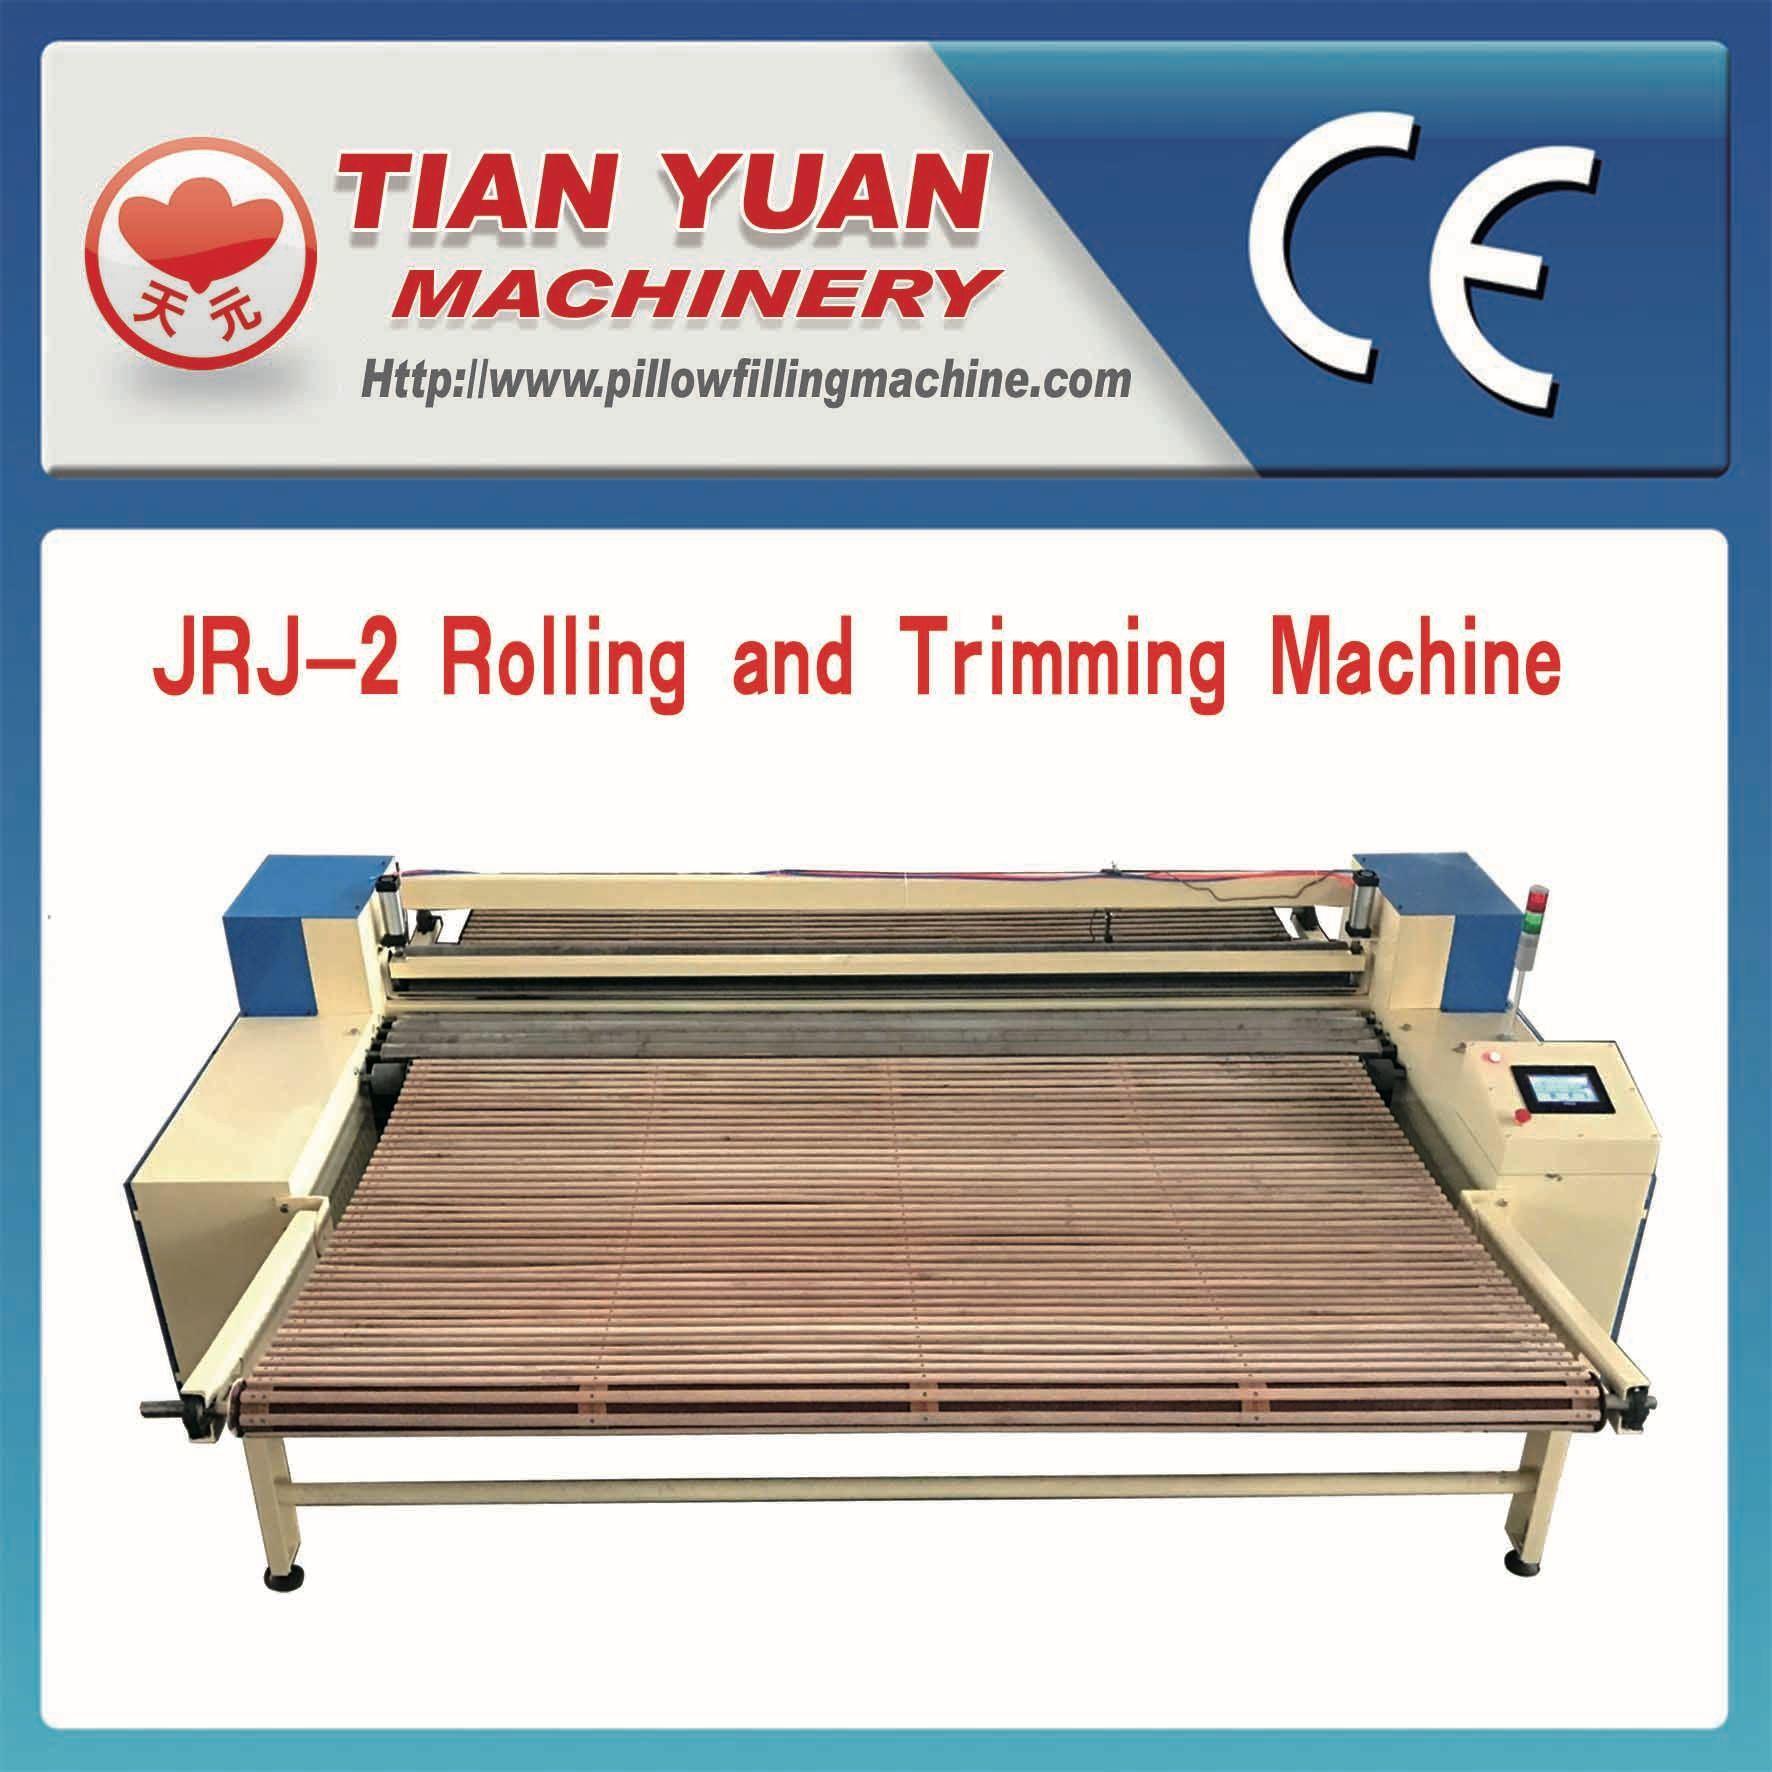 Stiff Wadding Cutting and Coiling Machine (JRJ-2)